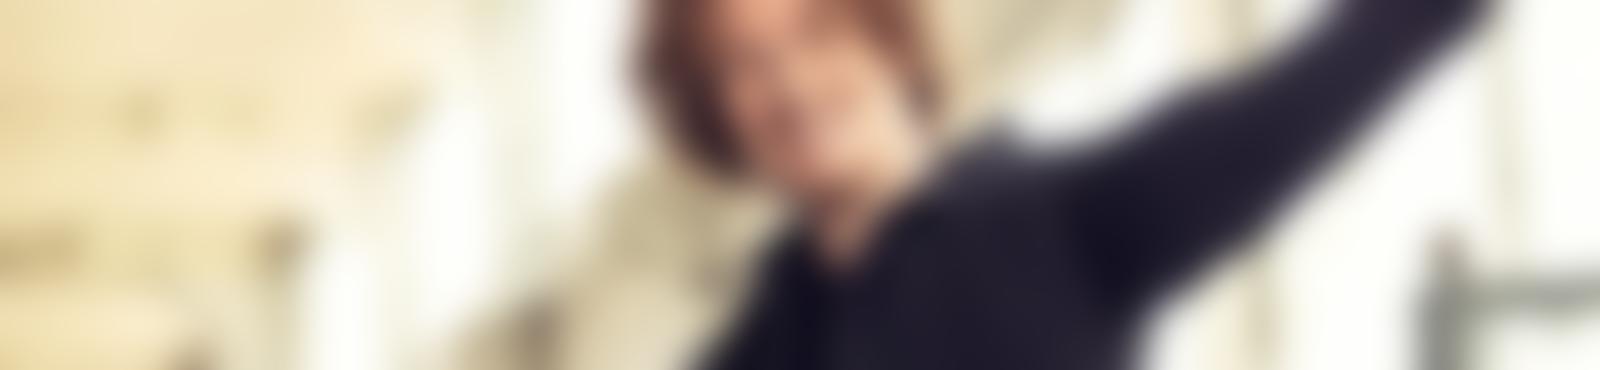 Blurred bb0667e3 9bd0 4692 a83d e38011bcac62